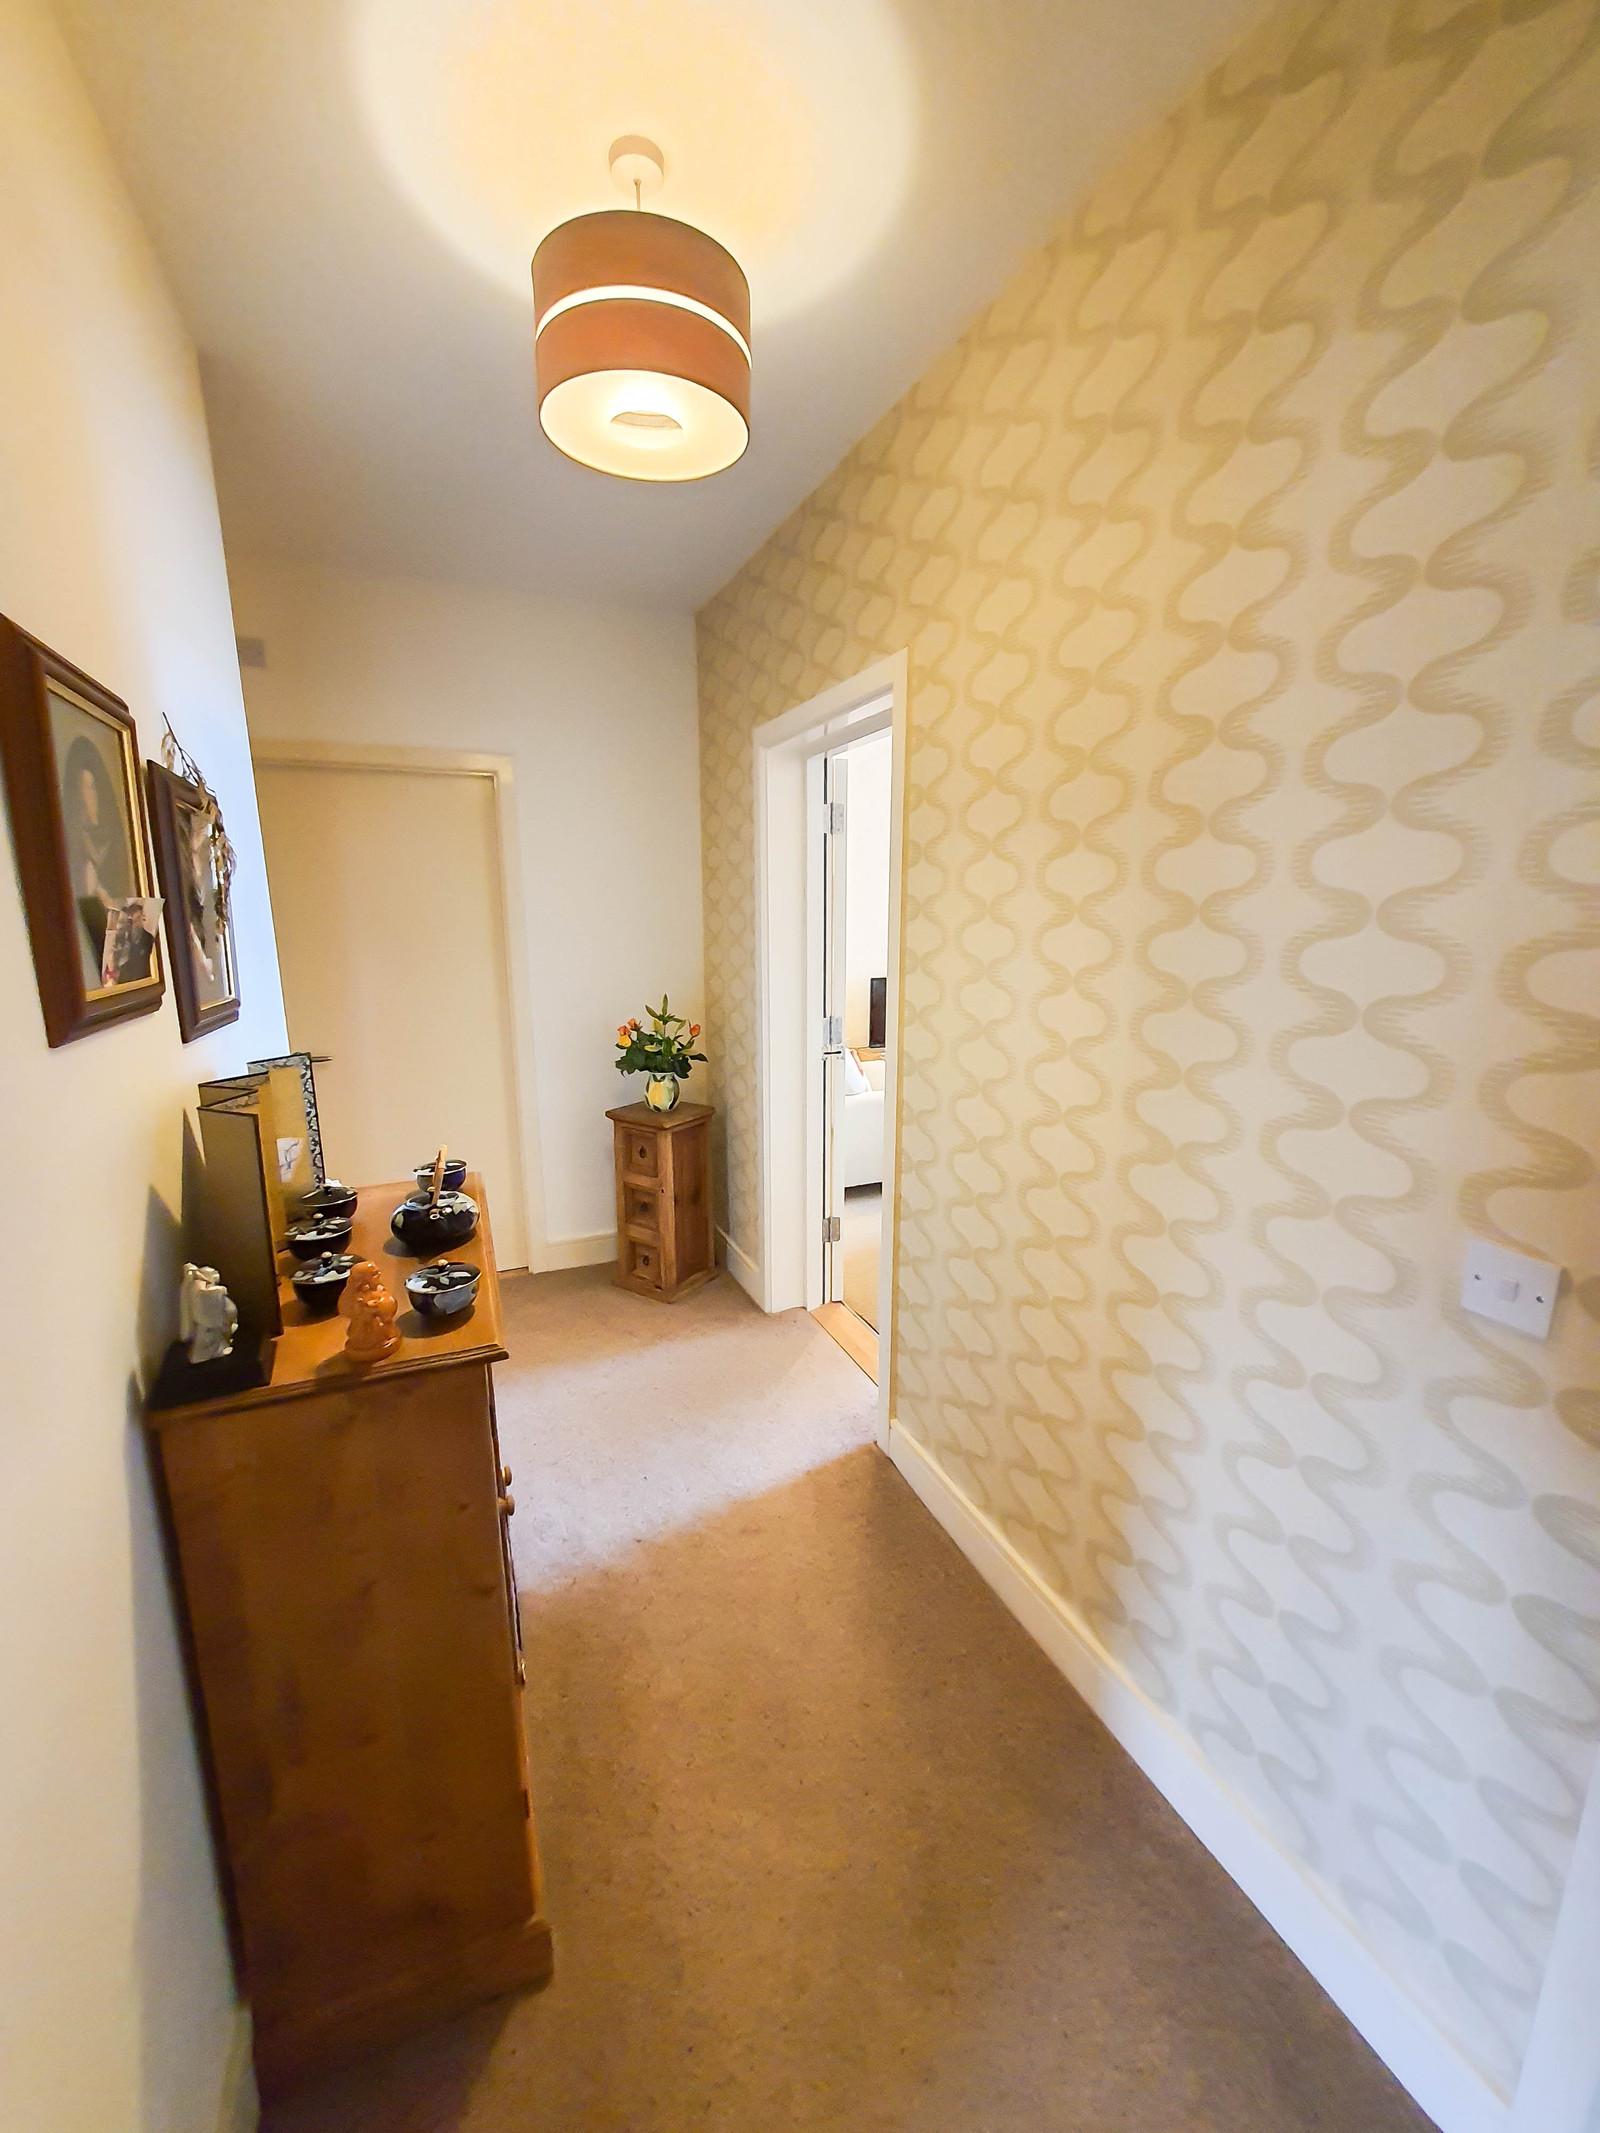 Apartment 8, Avenue Grove, Gorey, Co. Wexford